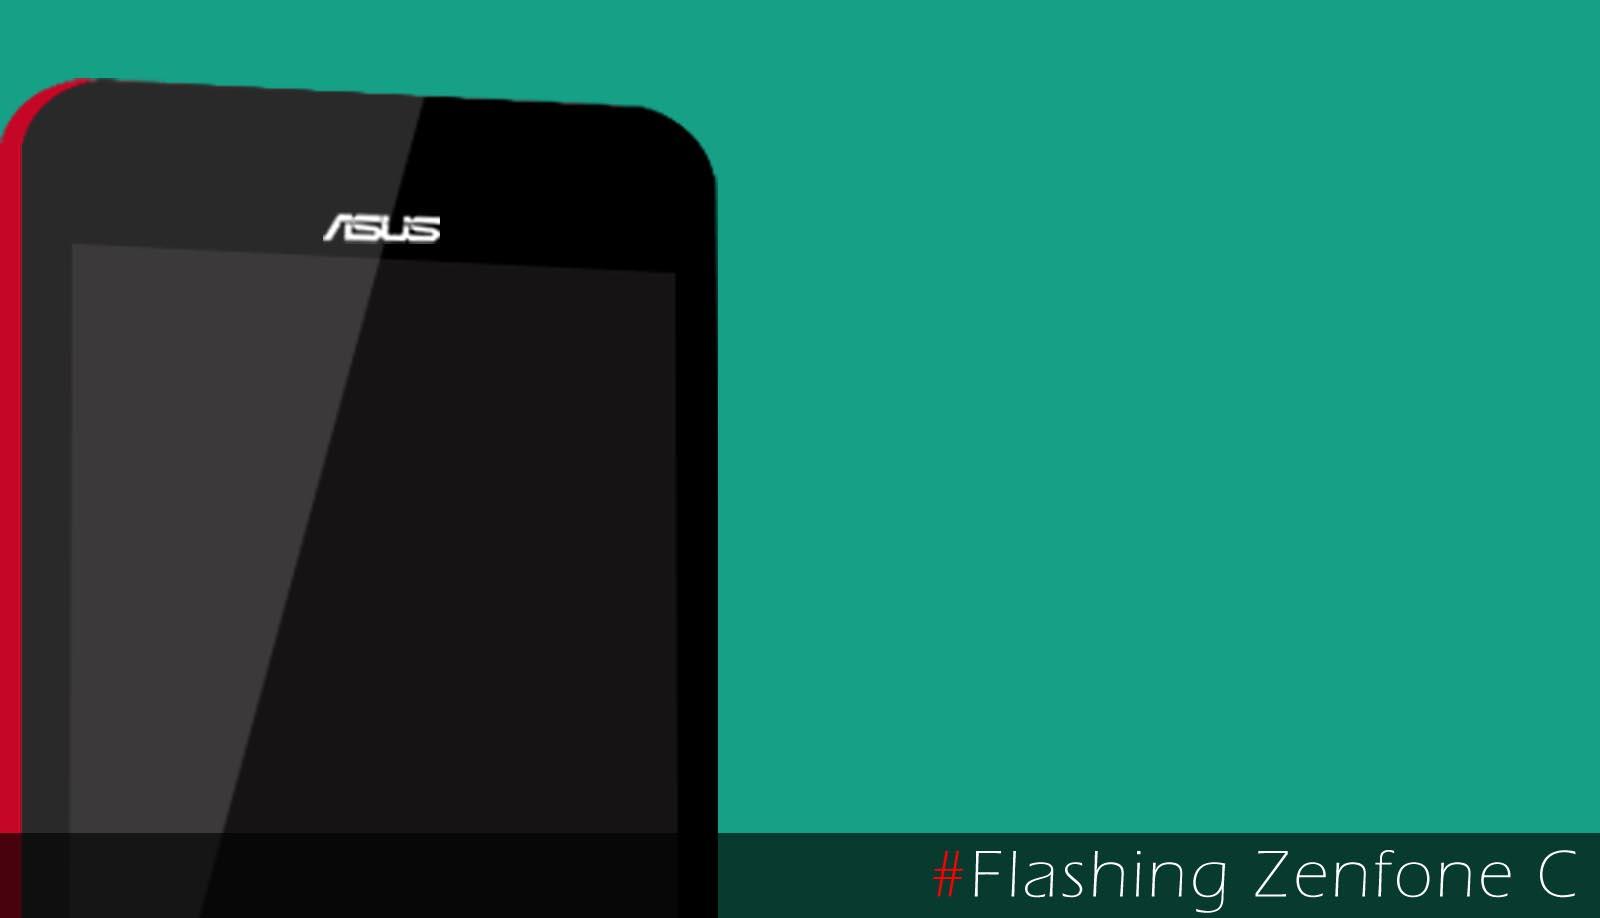 Flashing Zenfone C (ZC451CG) via ASUS Flash Tool